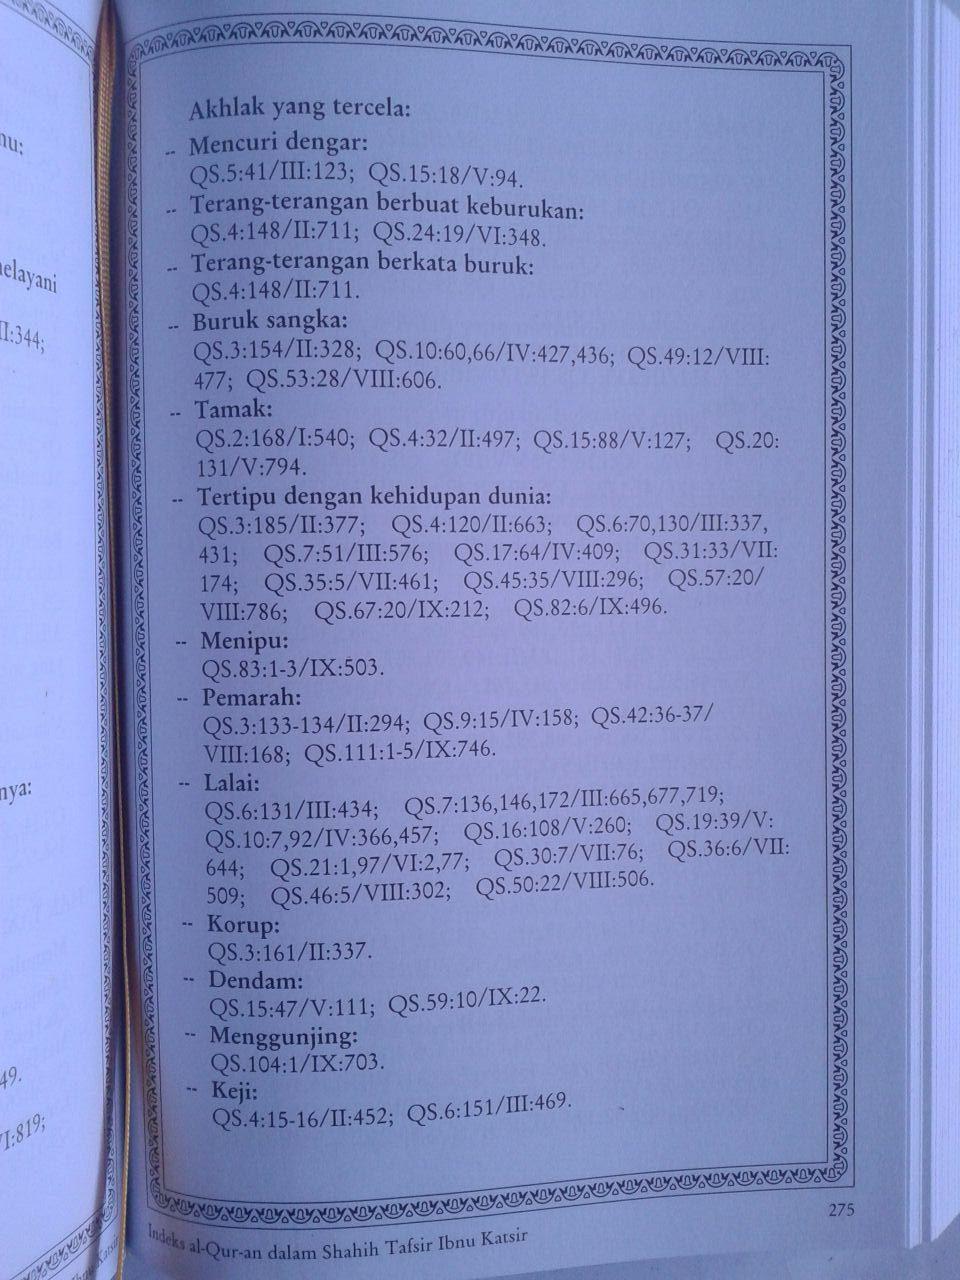 Buku Index Al-Qur'an Dalam Shahih Tafsir Ibnu Katsir